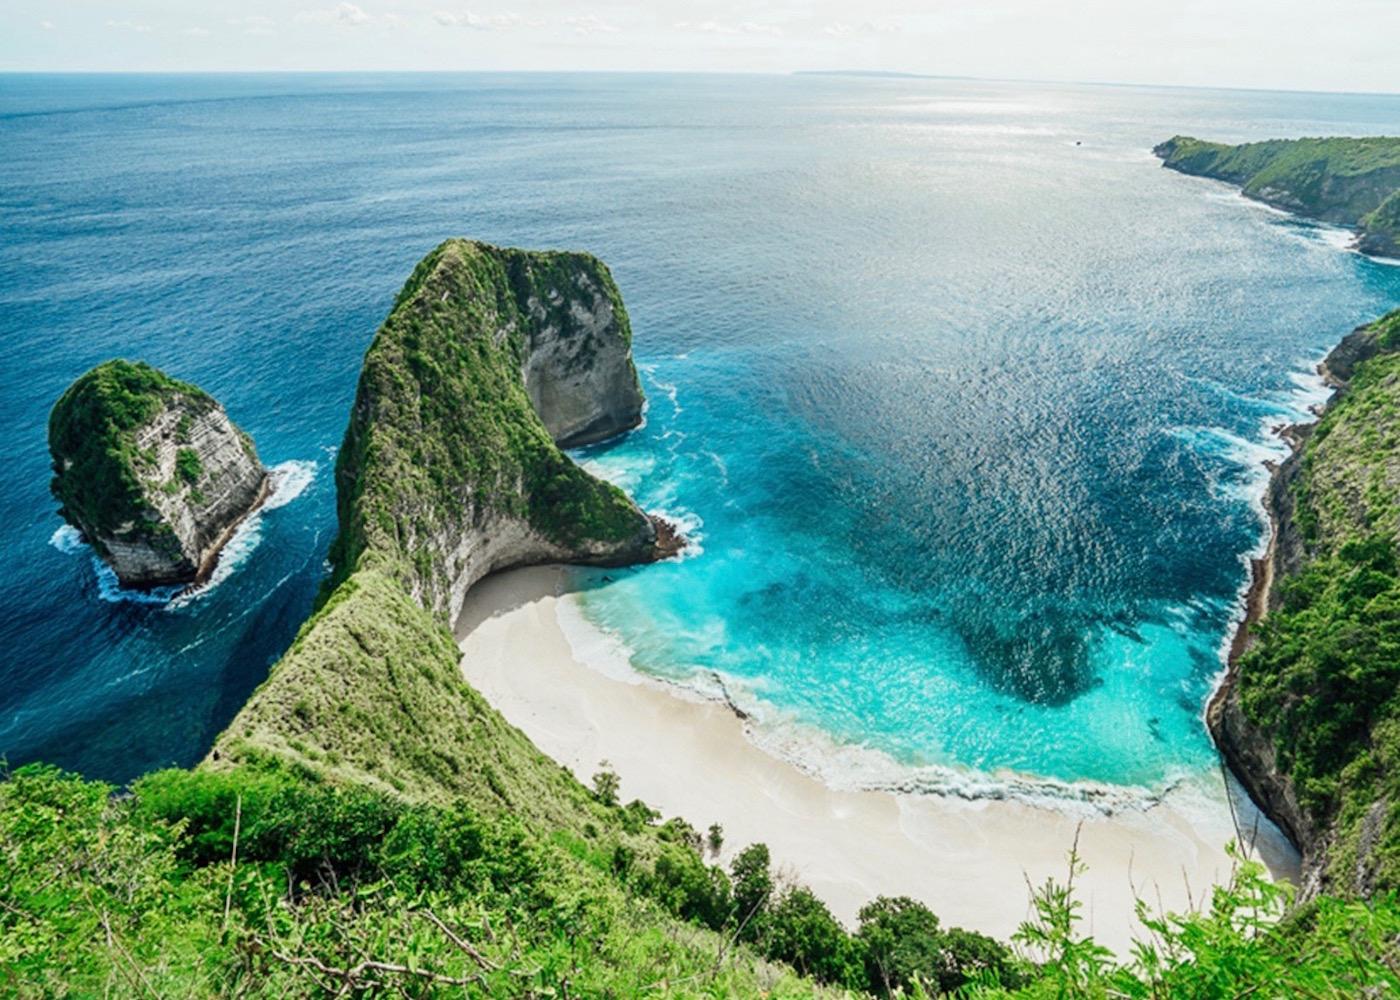 INDONESIA - ĐẢO NGỌC BALI